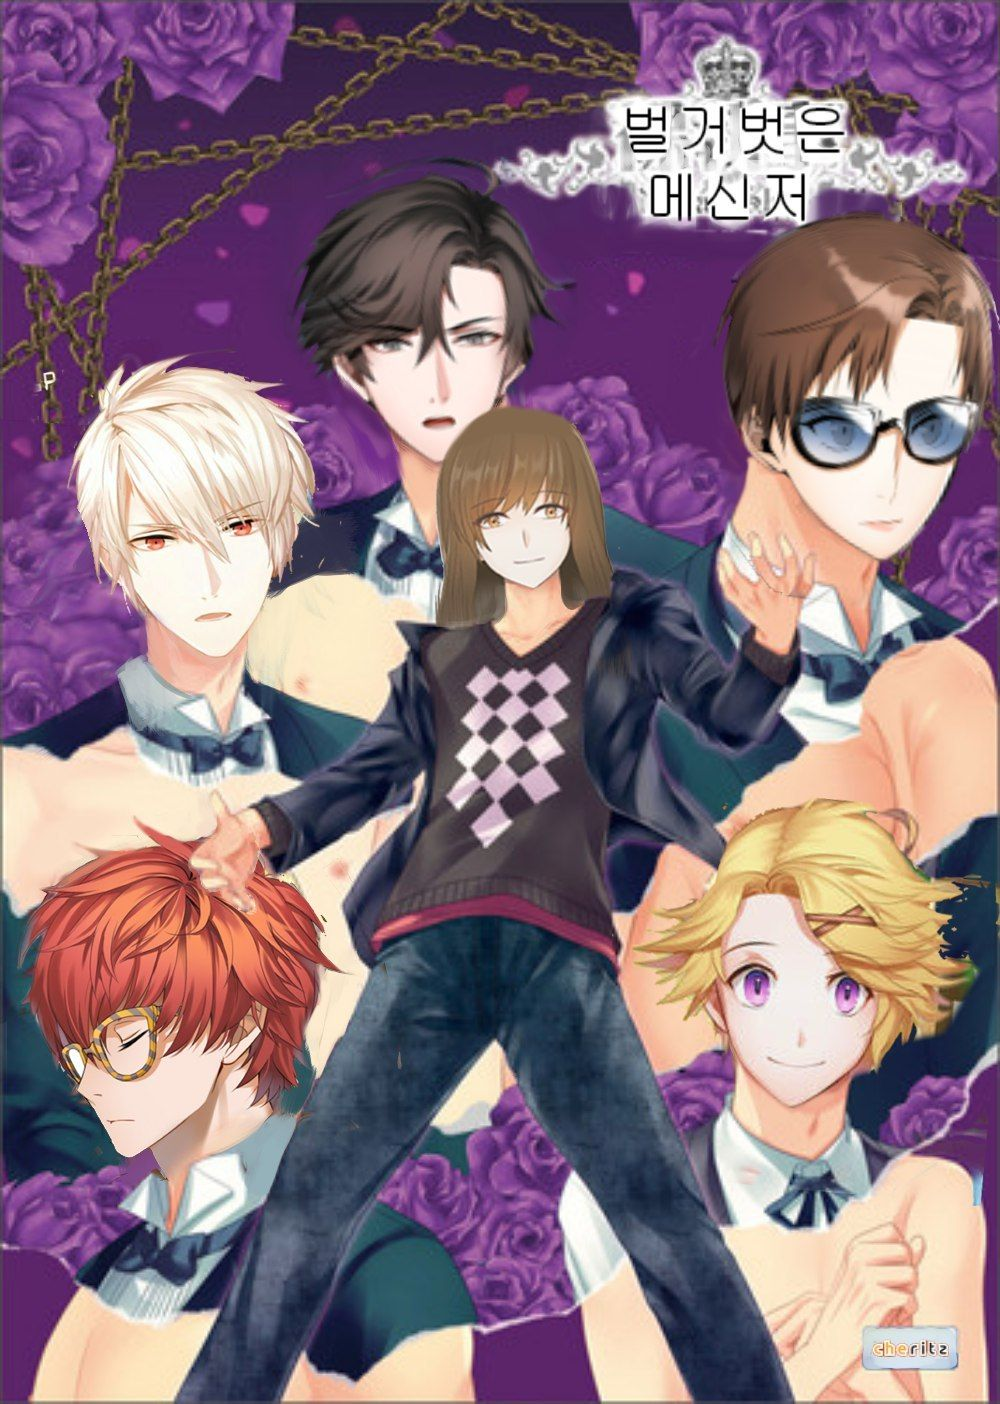 Hadaka Shitsuji Image #1332707 - Zerochan Anime Image Board